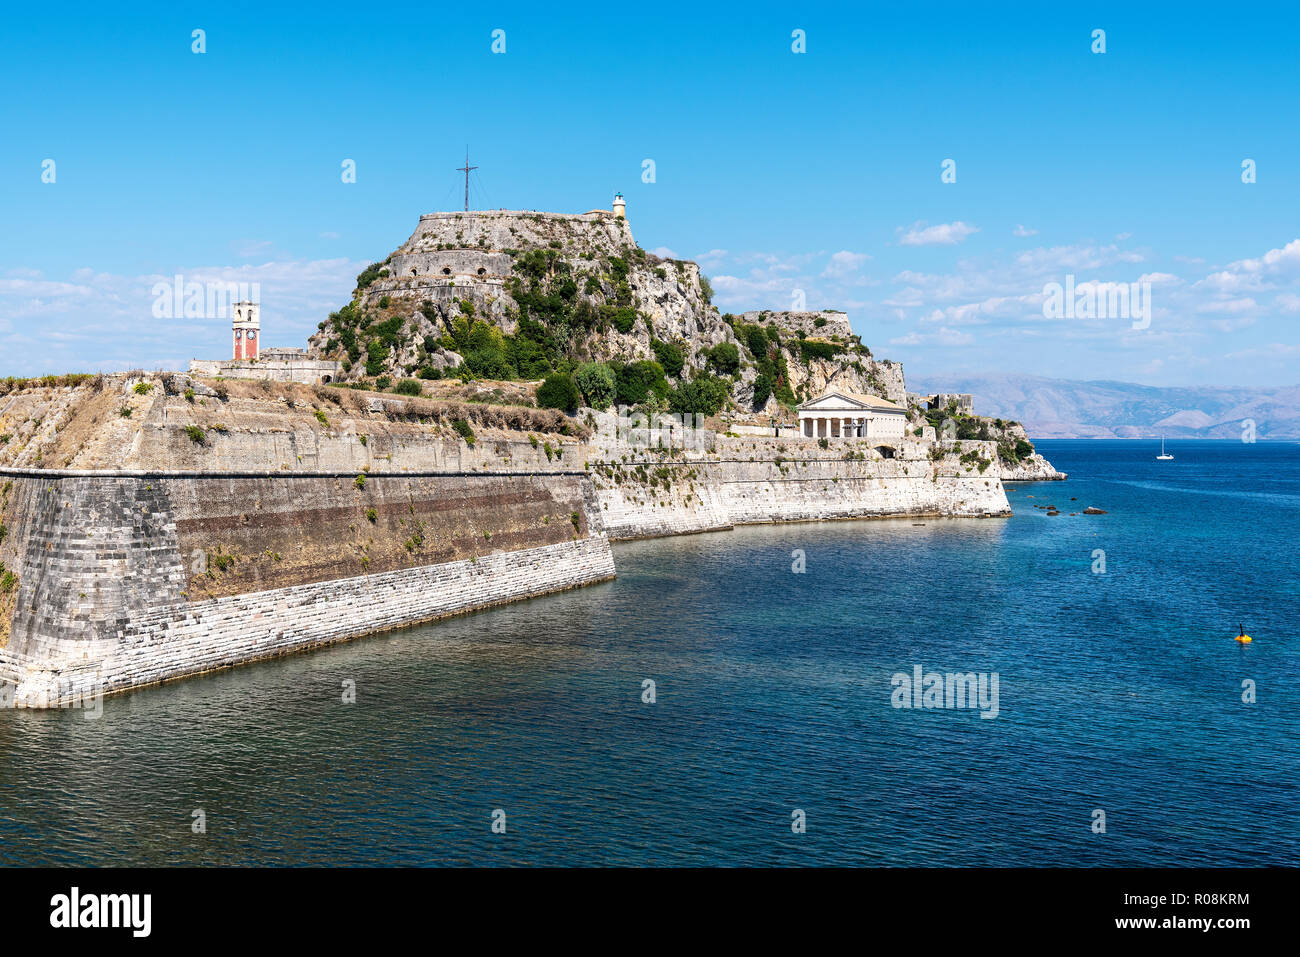 Old Fortress, Kerkyra, Corfu Island, Ionian Islands, Greece - Stock Image